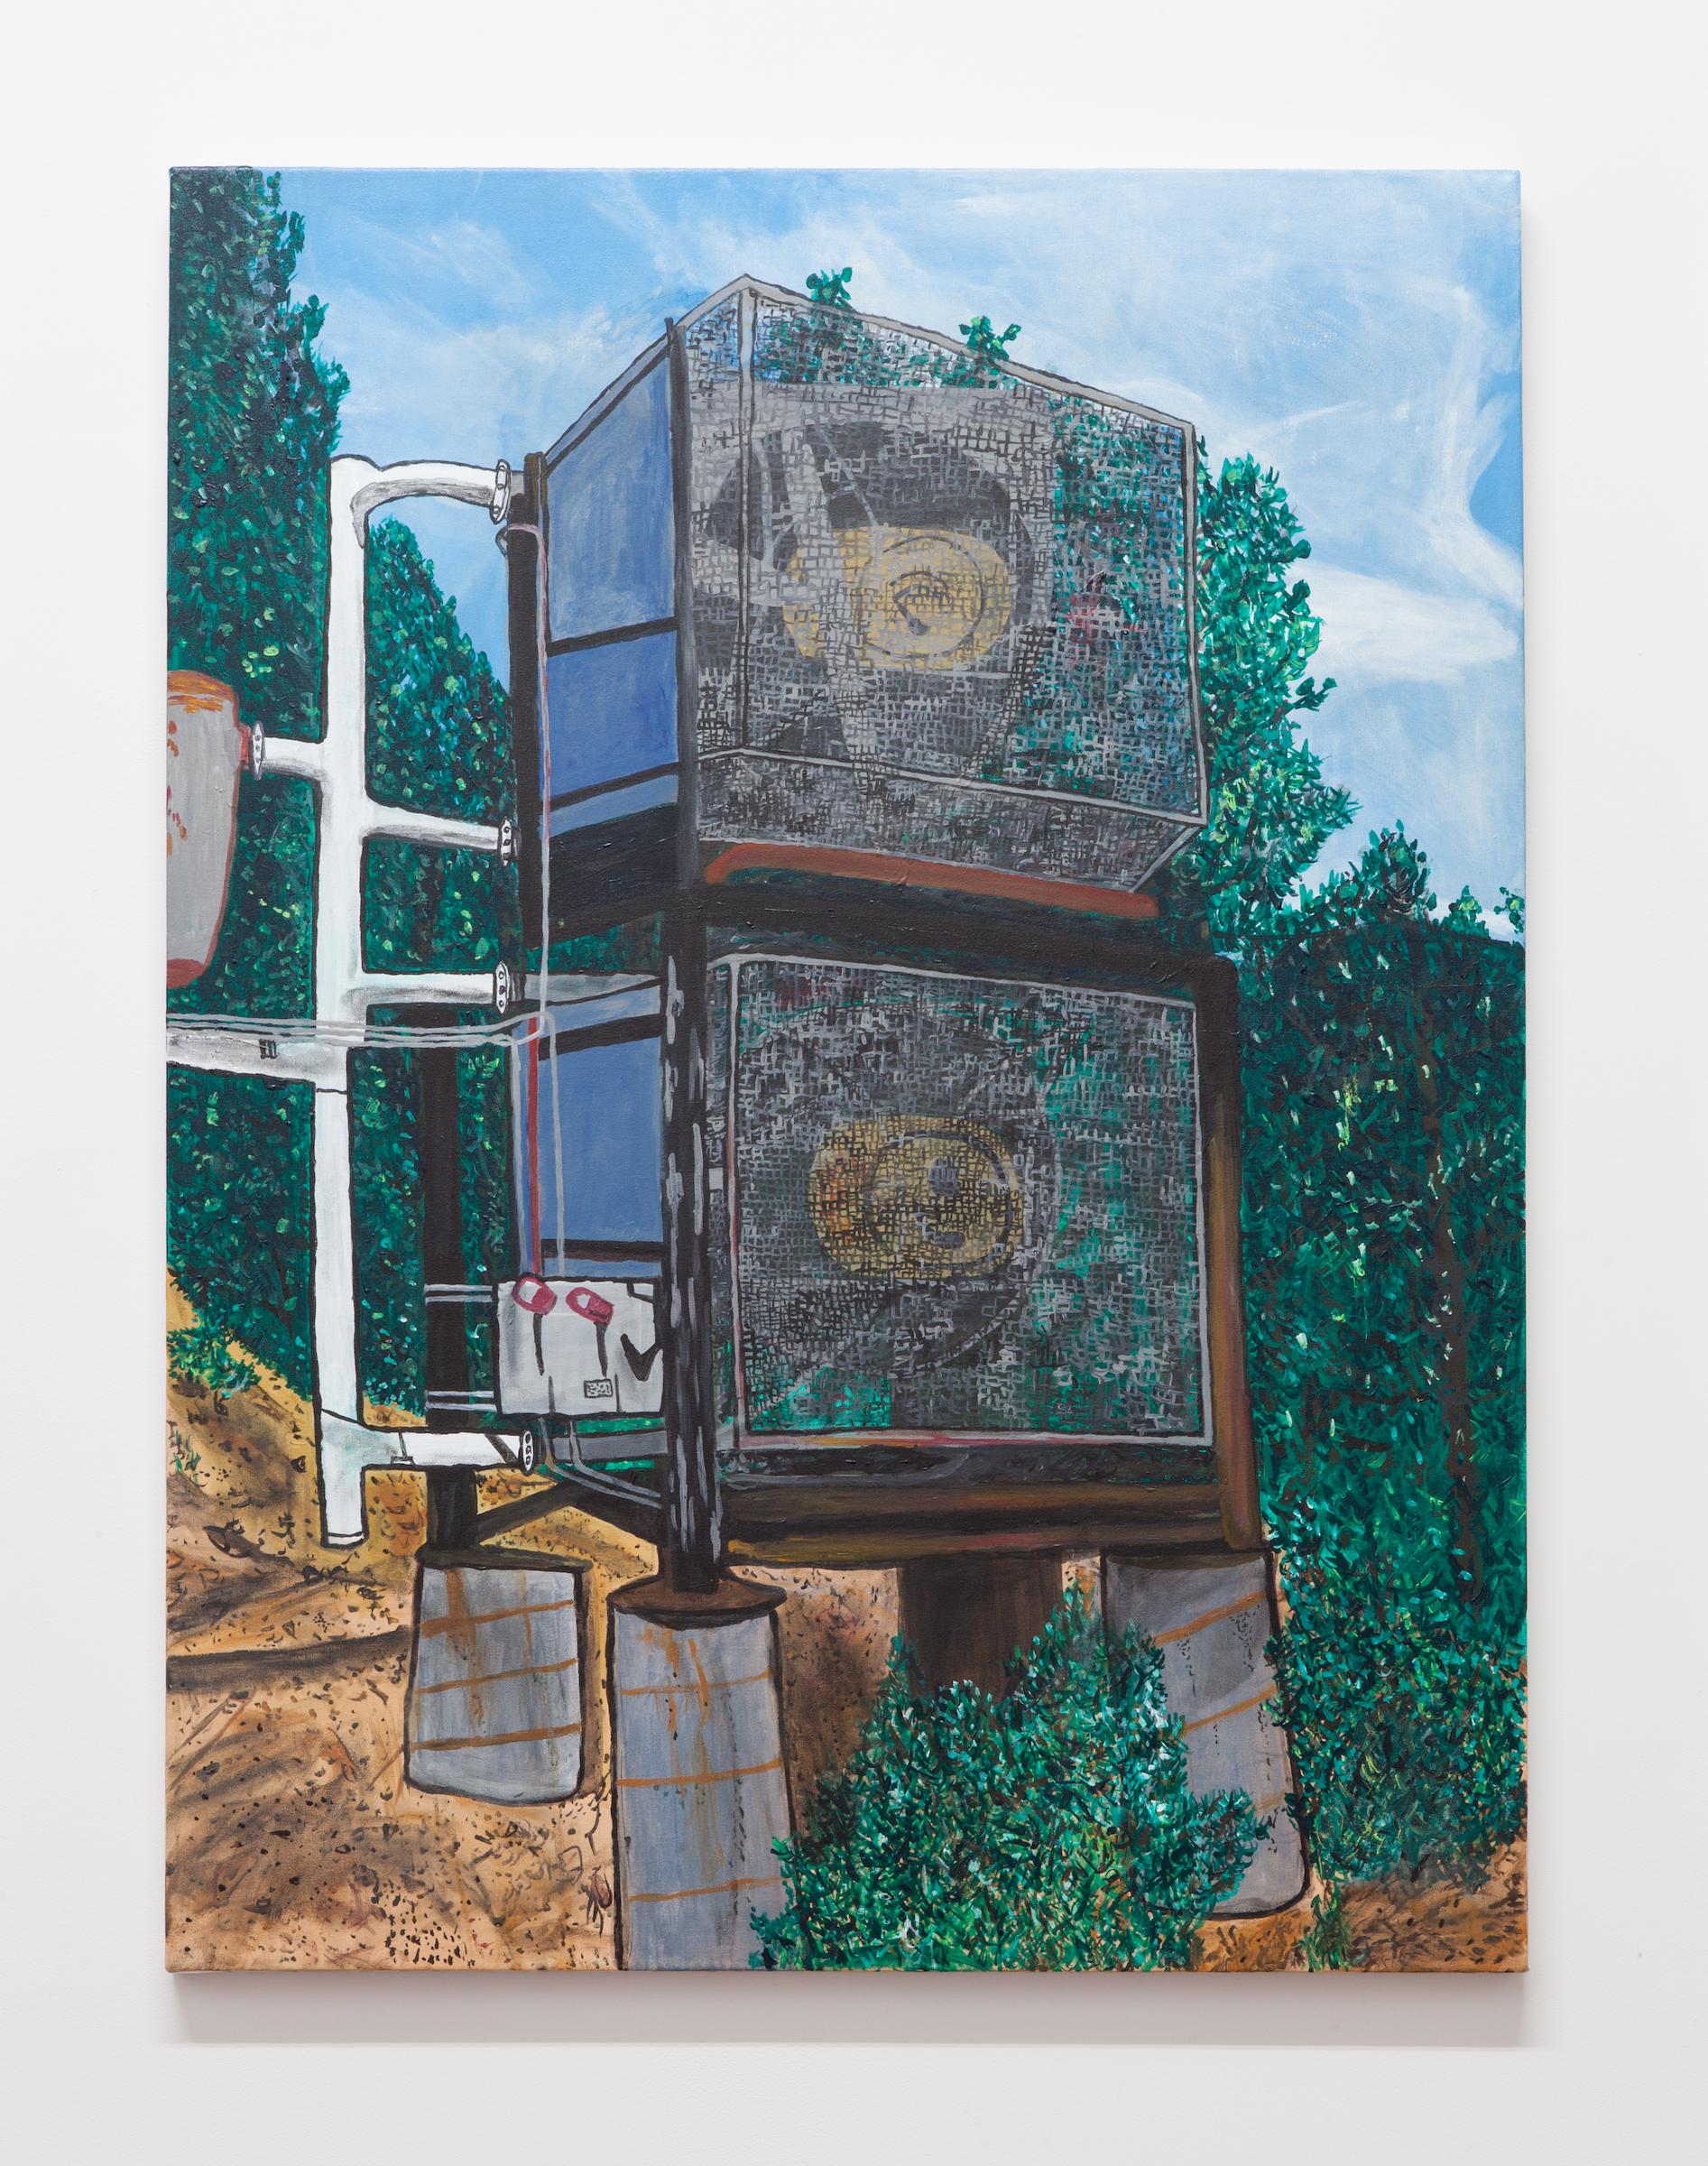 Jocko Weyland, Diamond Peak , 2014,acrylic on canvas,48 x 36 in